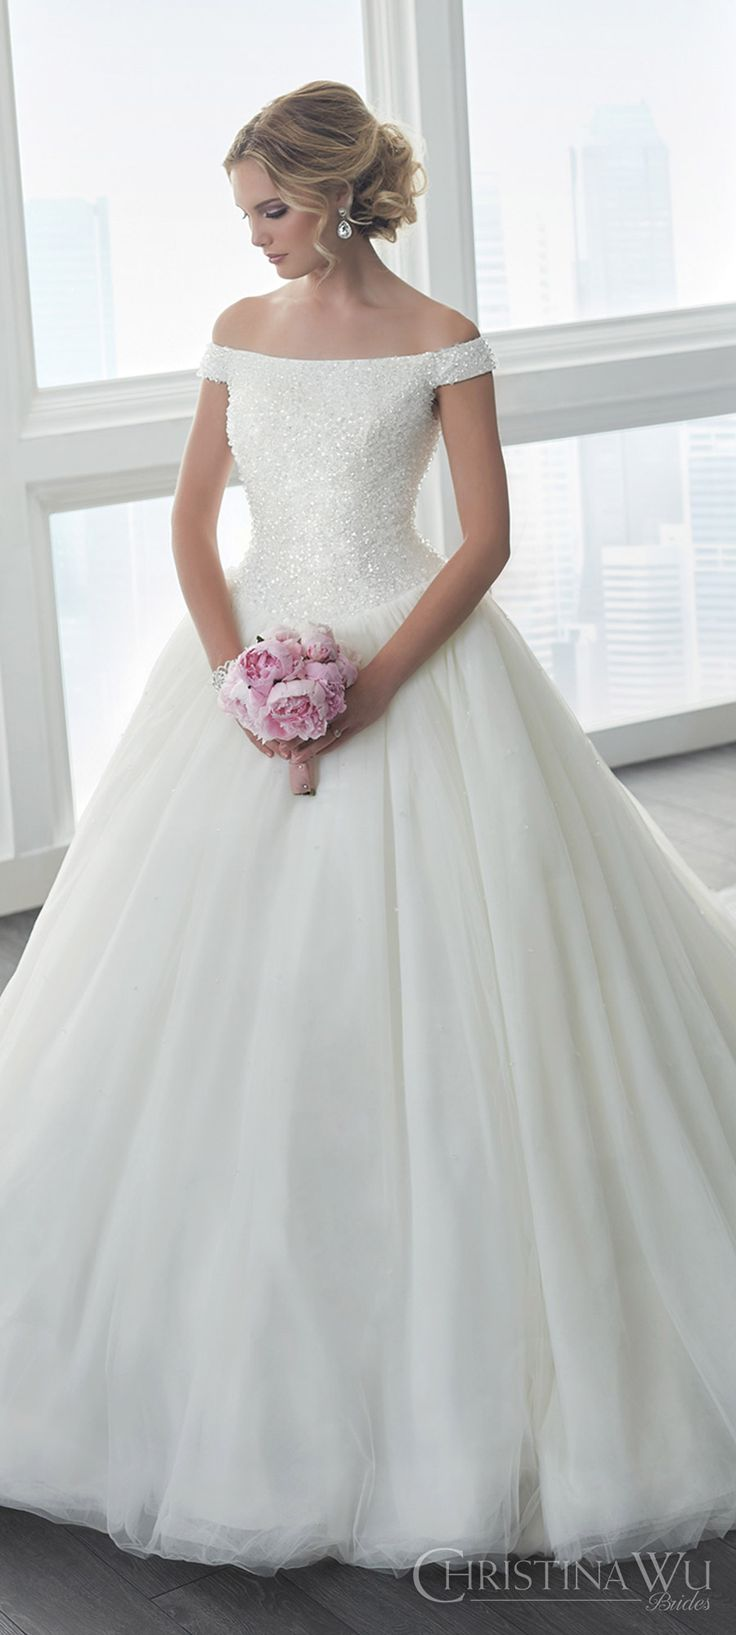 christina wu brides spring 2017 bridal off shoulder heavily beaded bodice ball gown wedding dress (15633) zfv romantic princess long train #bridal #wedding